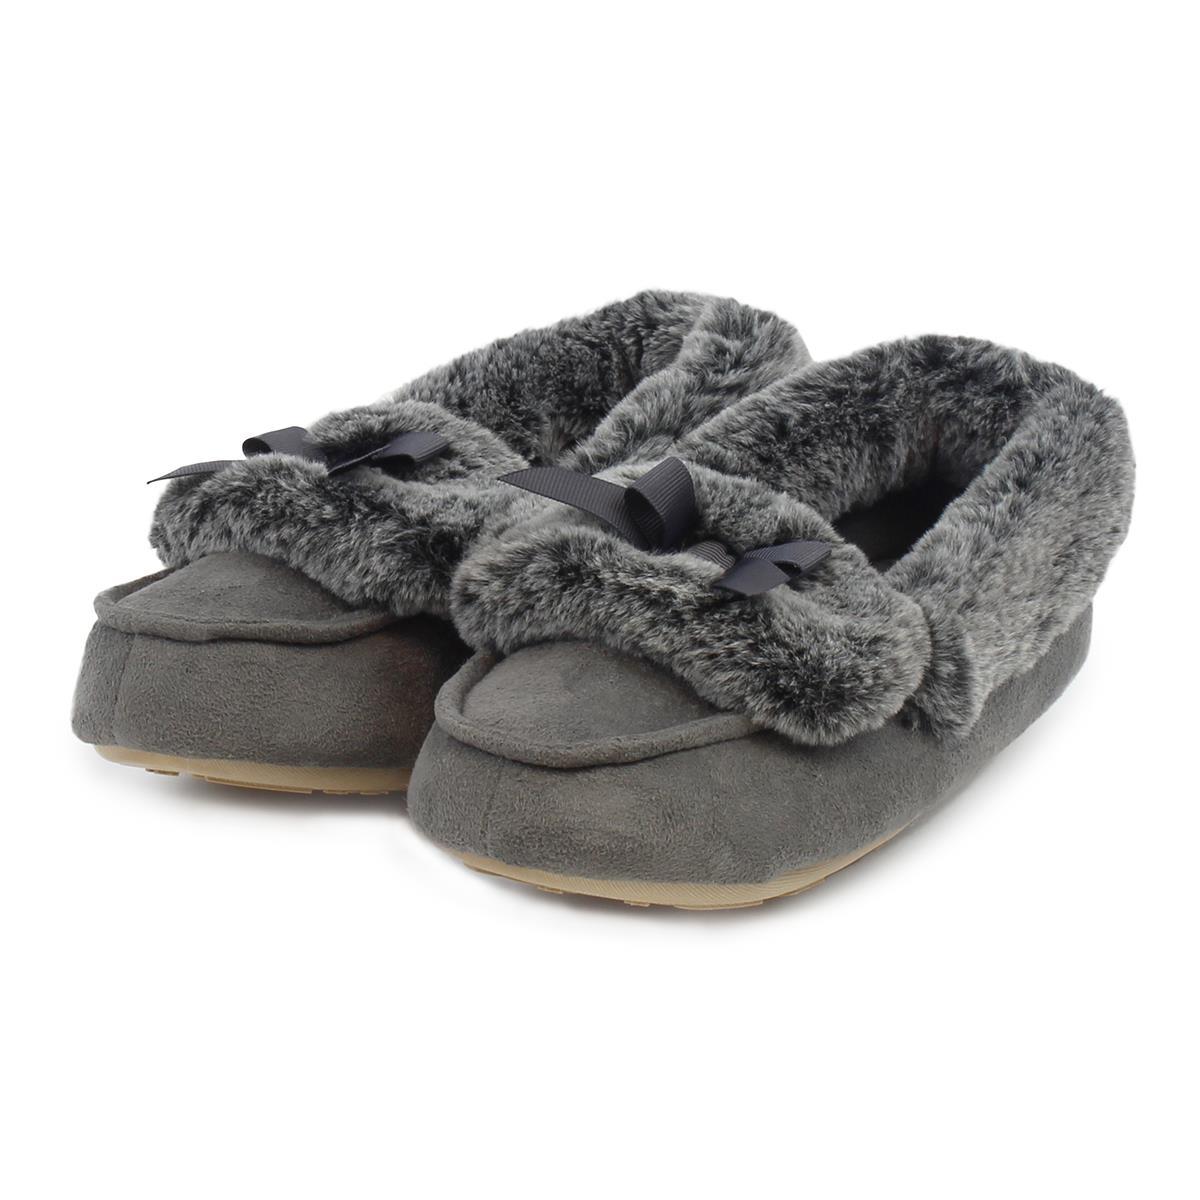 2762c96d1d13 totes Ladies Suedette Fur Moccasin Slippers Grey